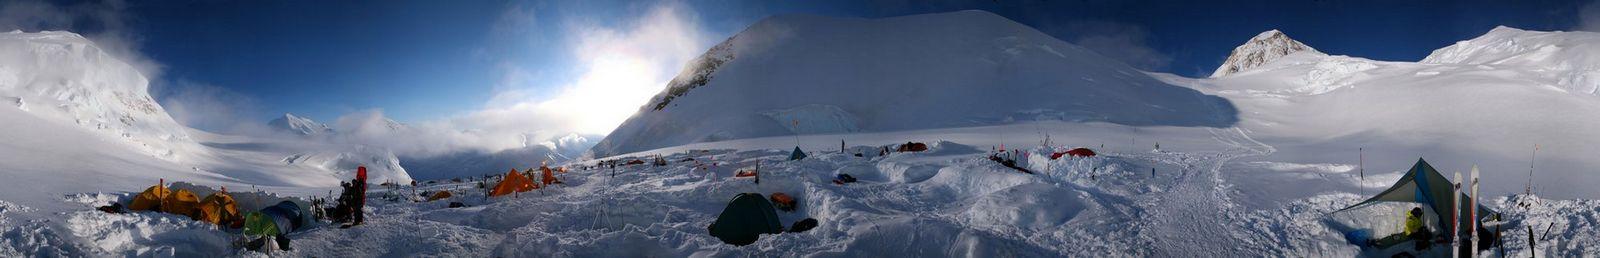 panorama,West Buttress,route,Denali,Alaska,mountaineering,360,degree,pano,altitude,high, photo